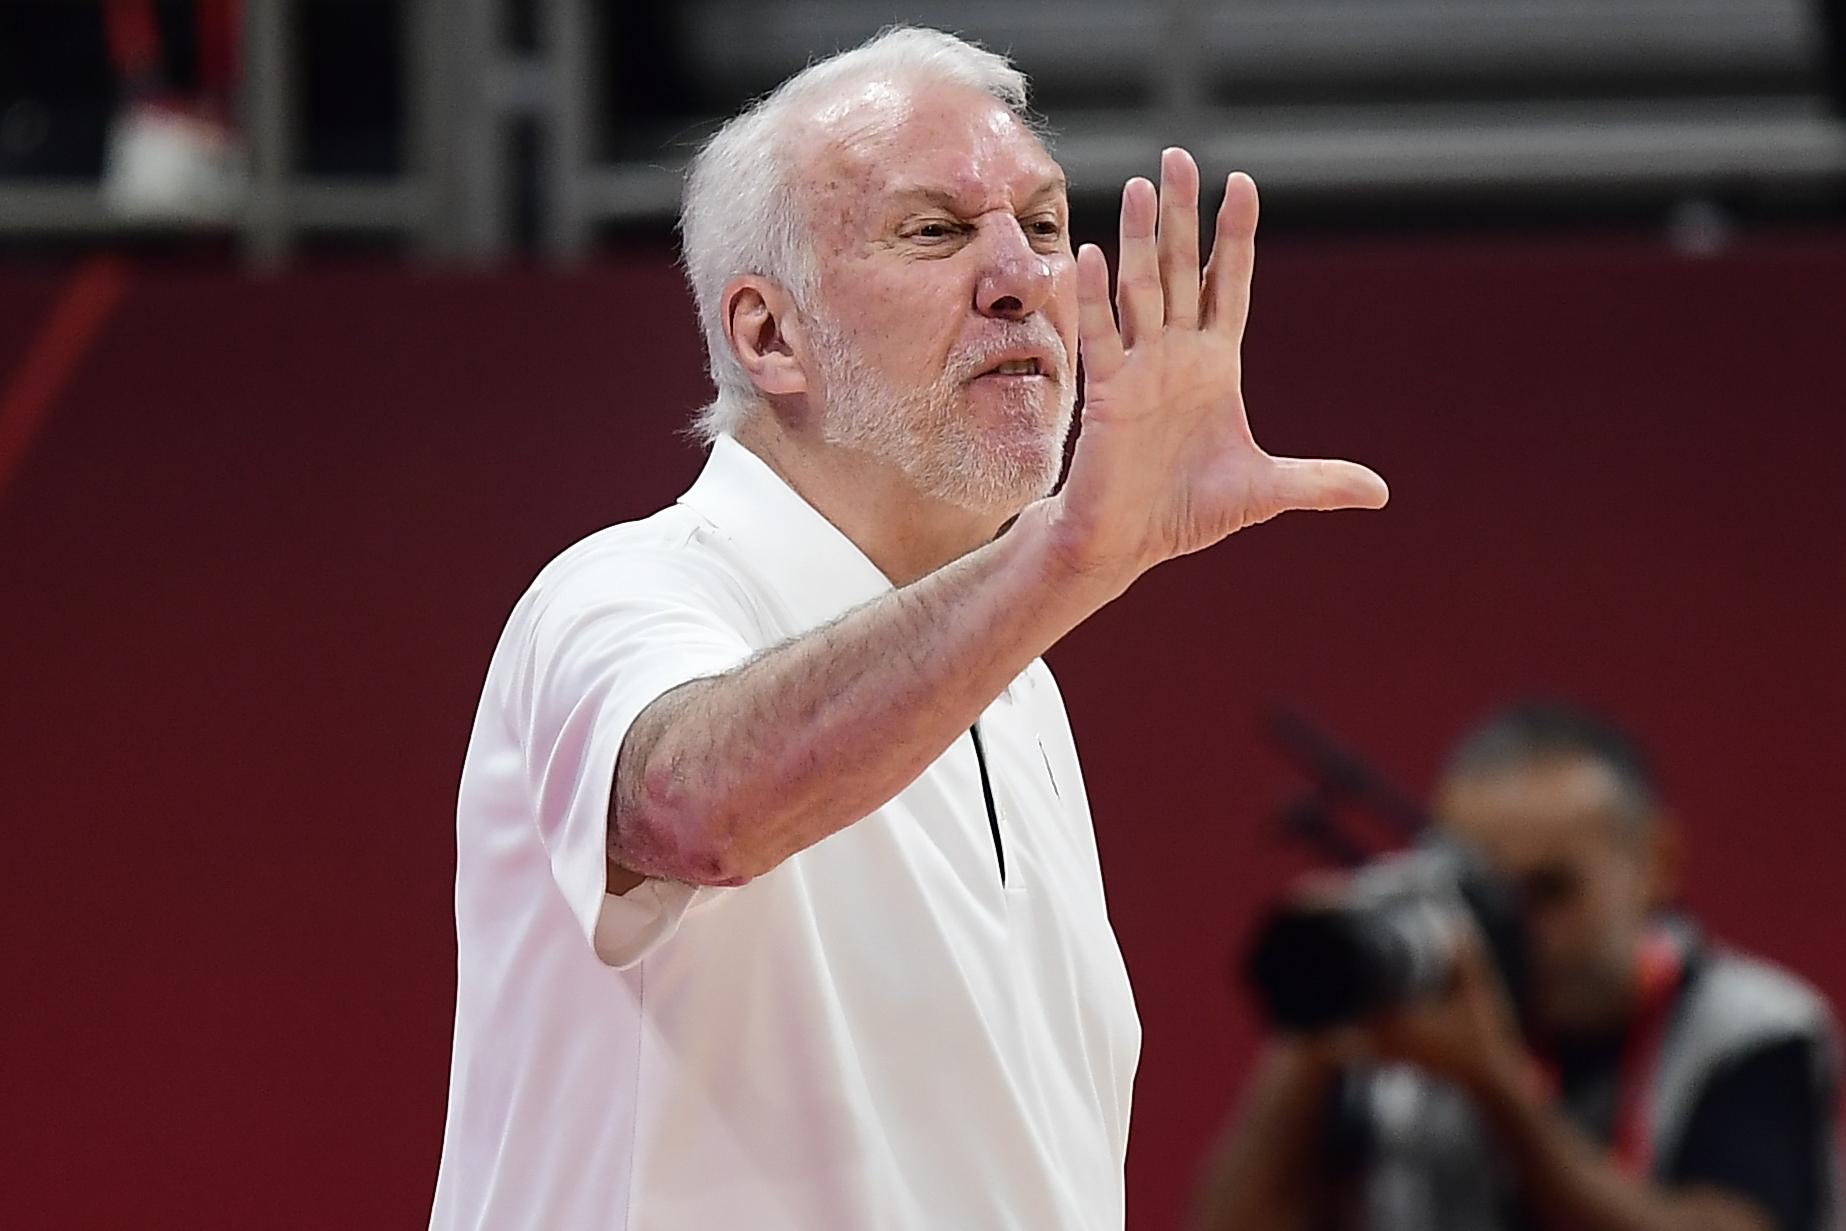 Gregg Popovich Says Criticizing Team USA's FIBA Performance 'Immature, Arrogant'